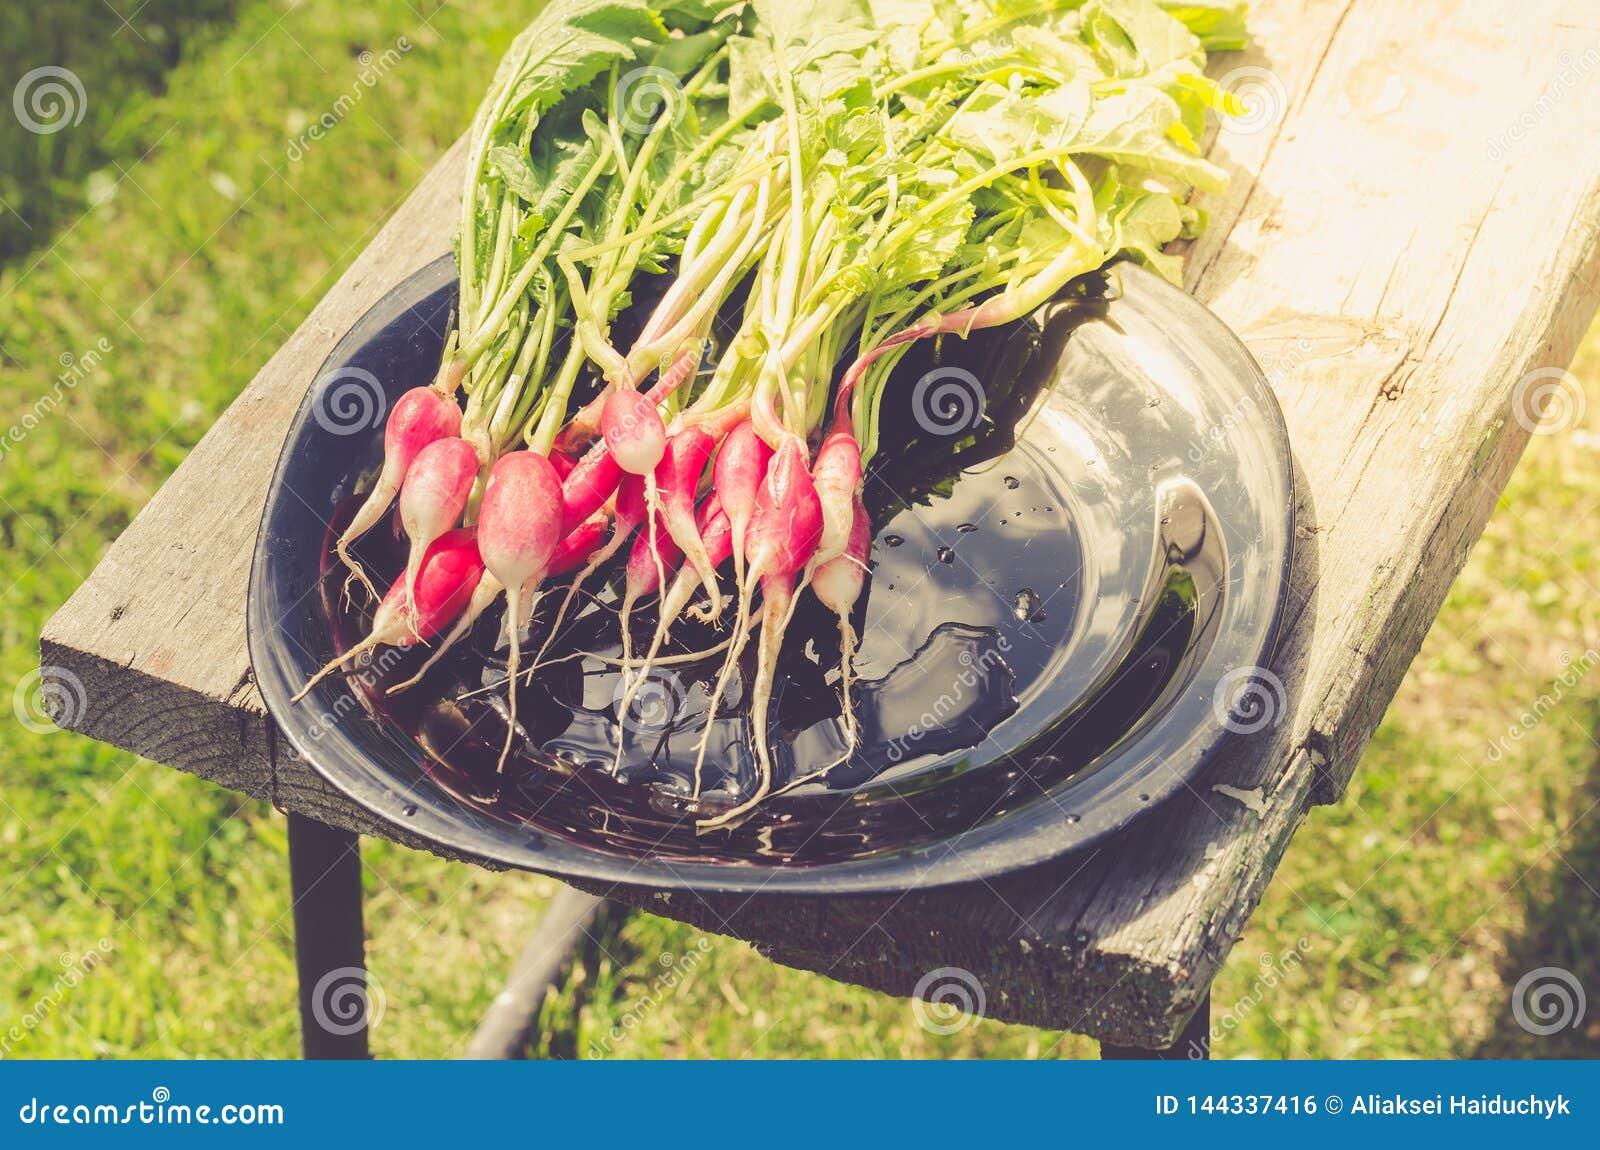 fresh garden radish in a garden/fresh radish in a black bowl in the open air. Top view